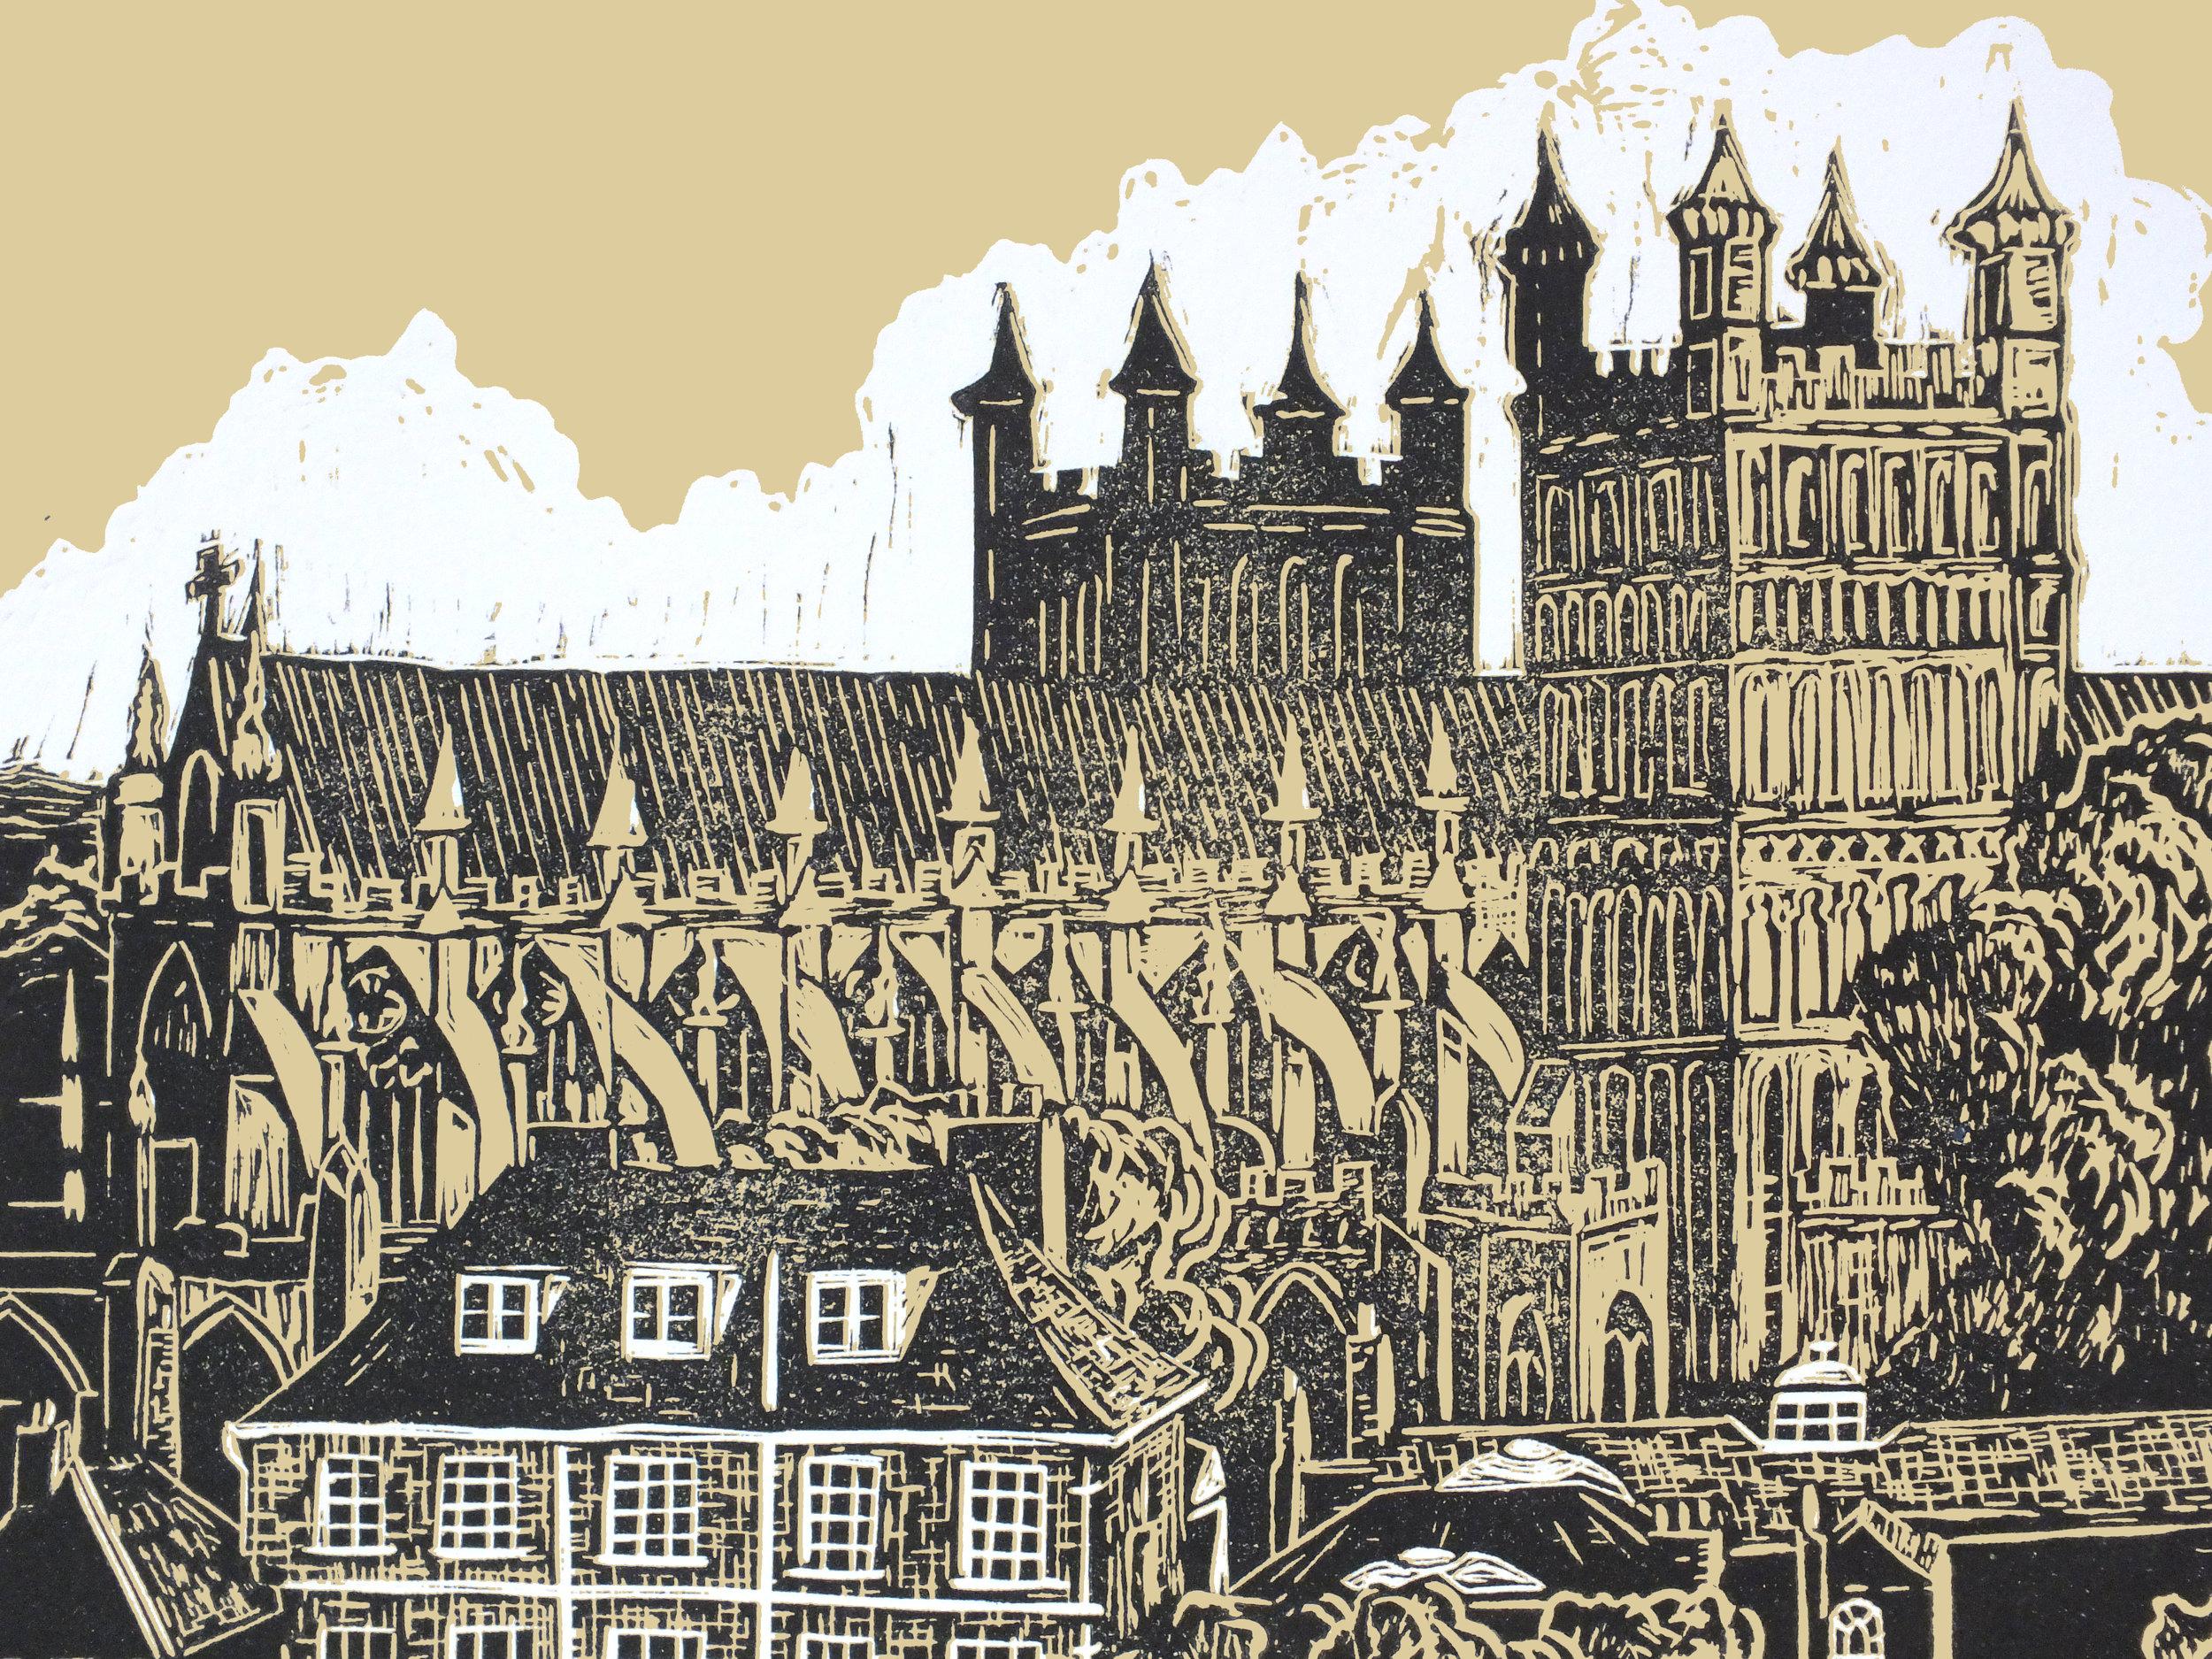 Exeter Cathedral Beige AP image.jpg